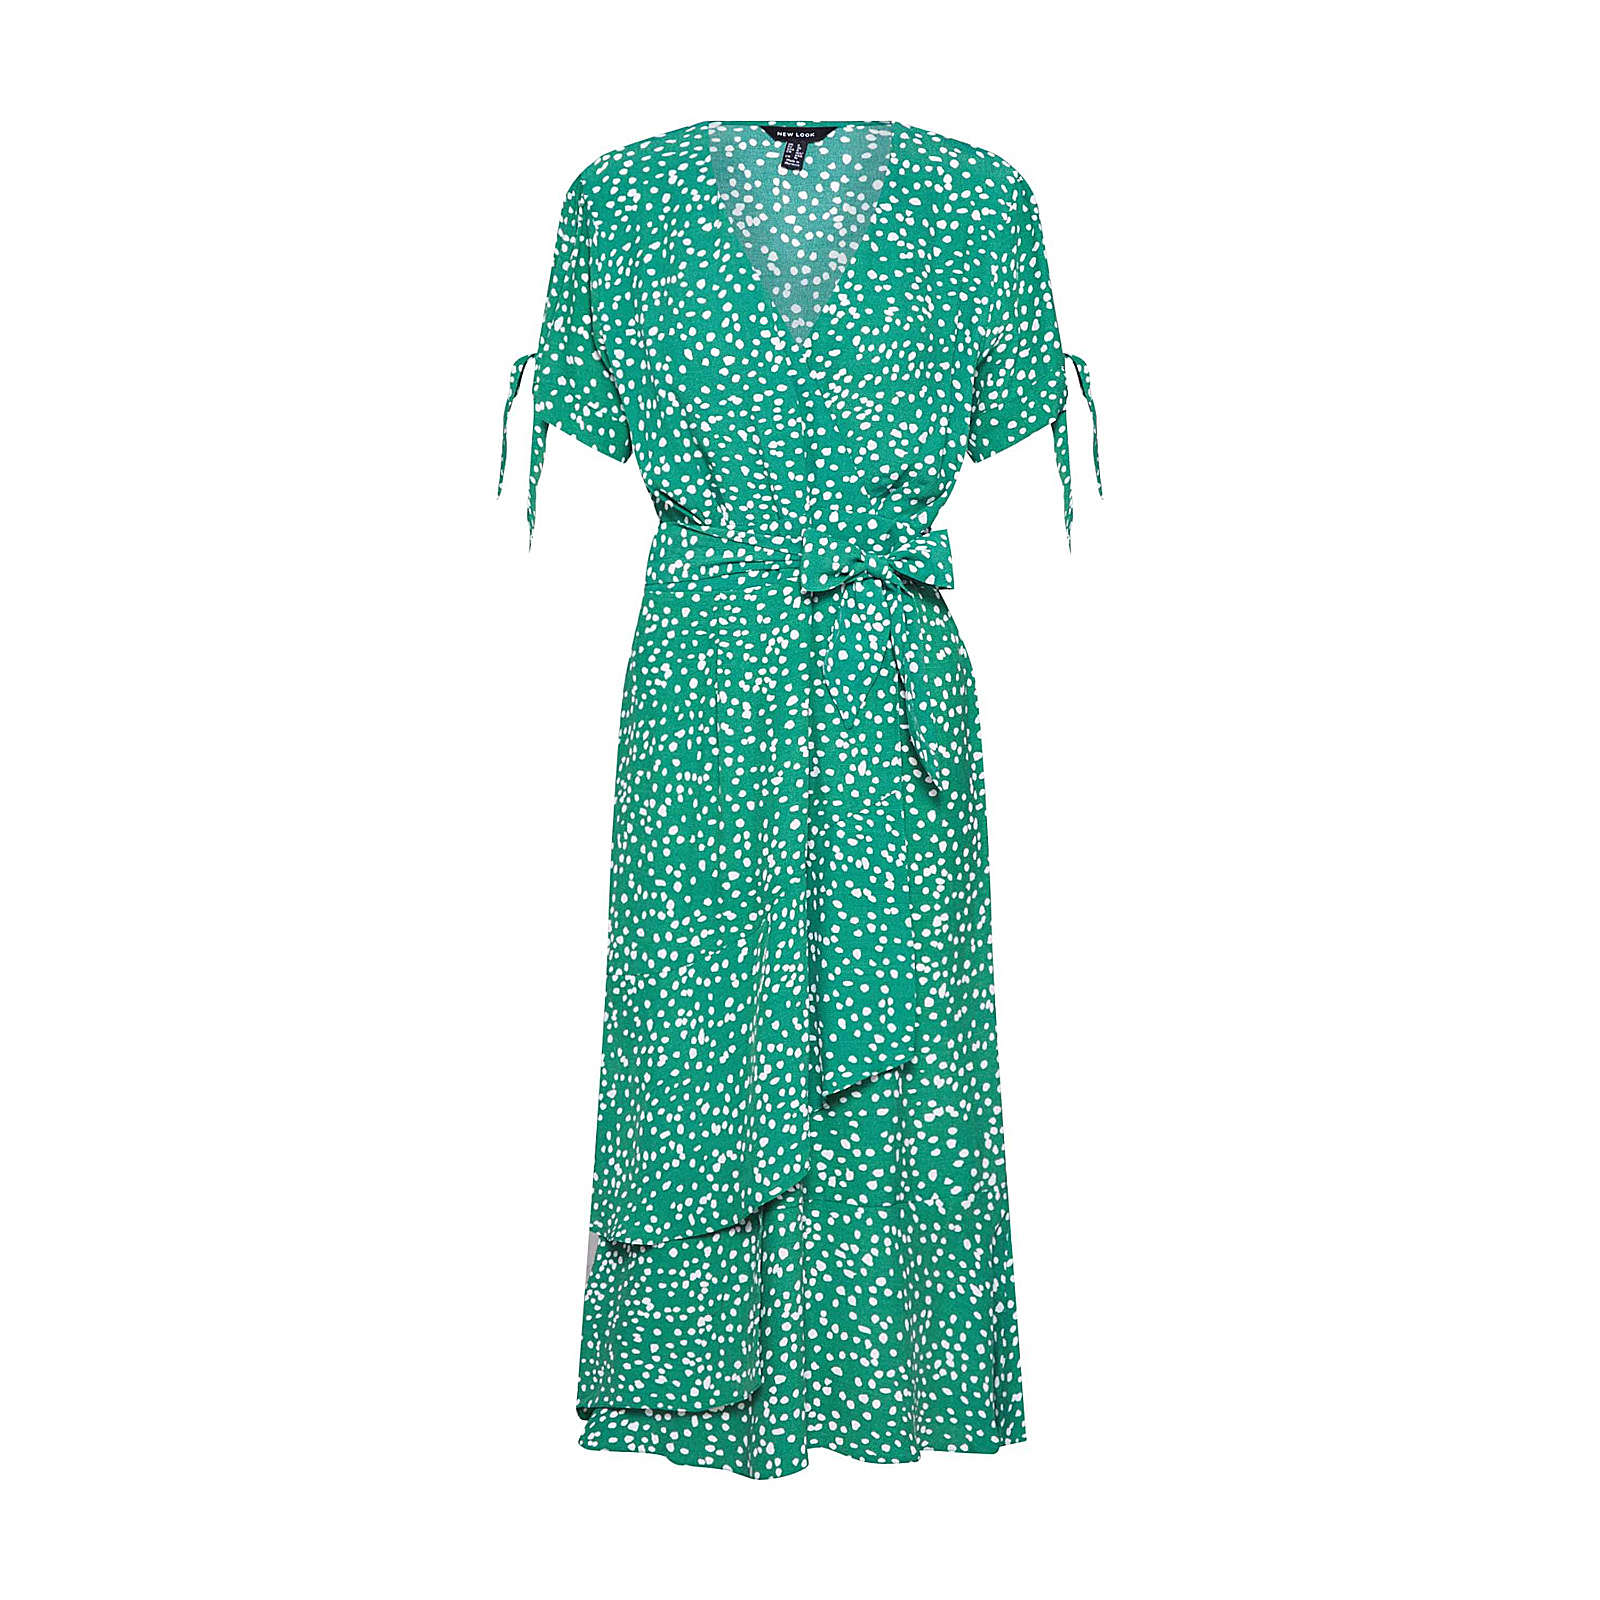 NEW LOOK Sommerkleid LARA Sommerkleider grün Damen Gr. 40